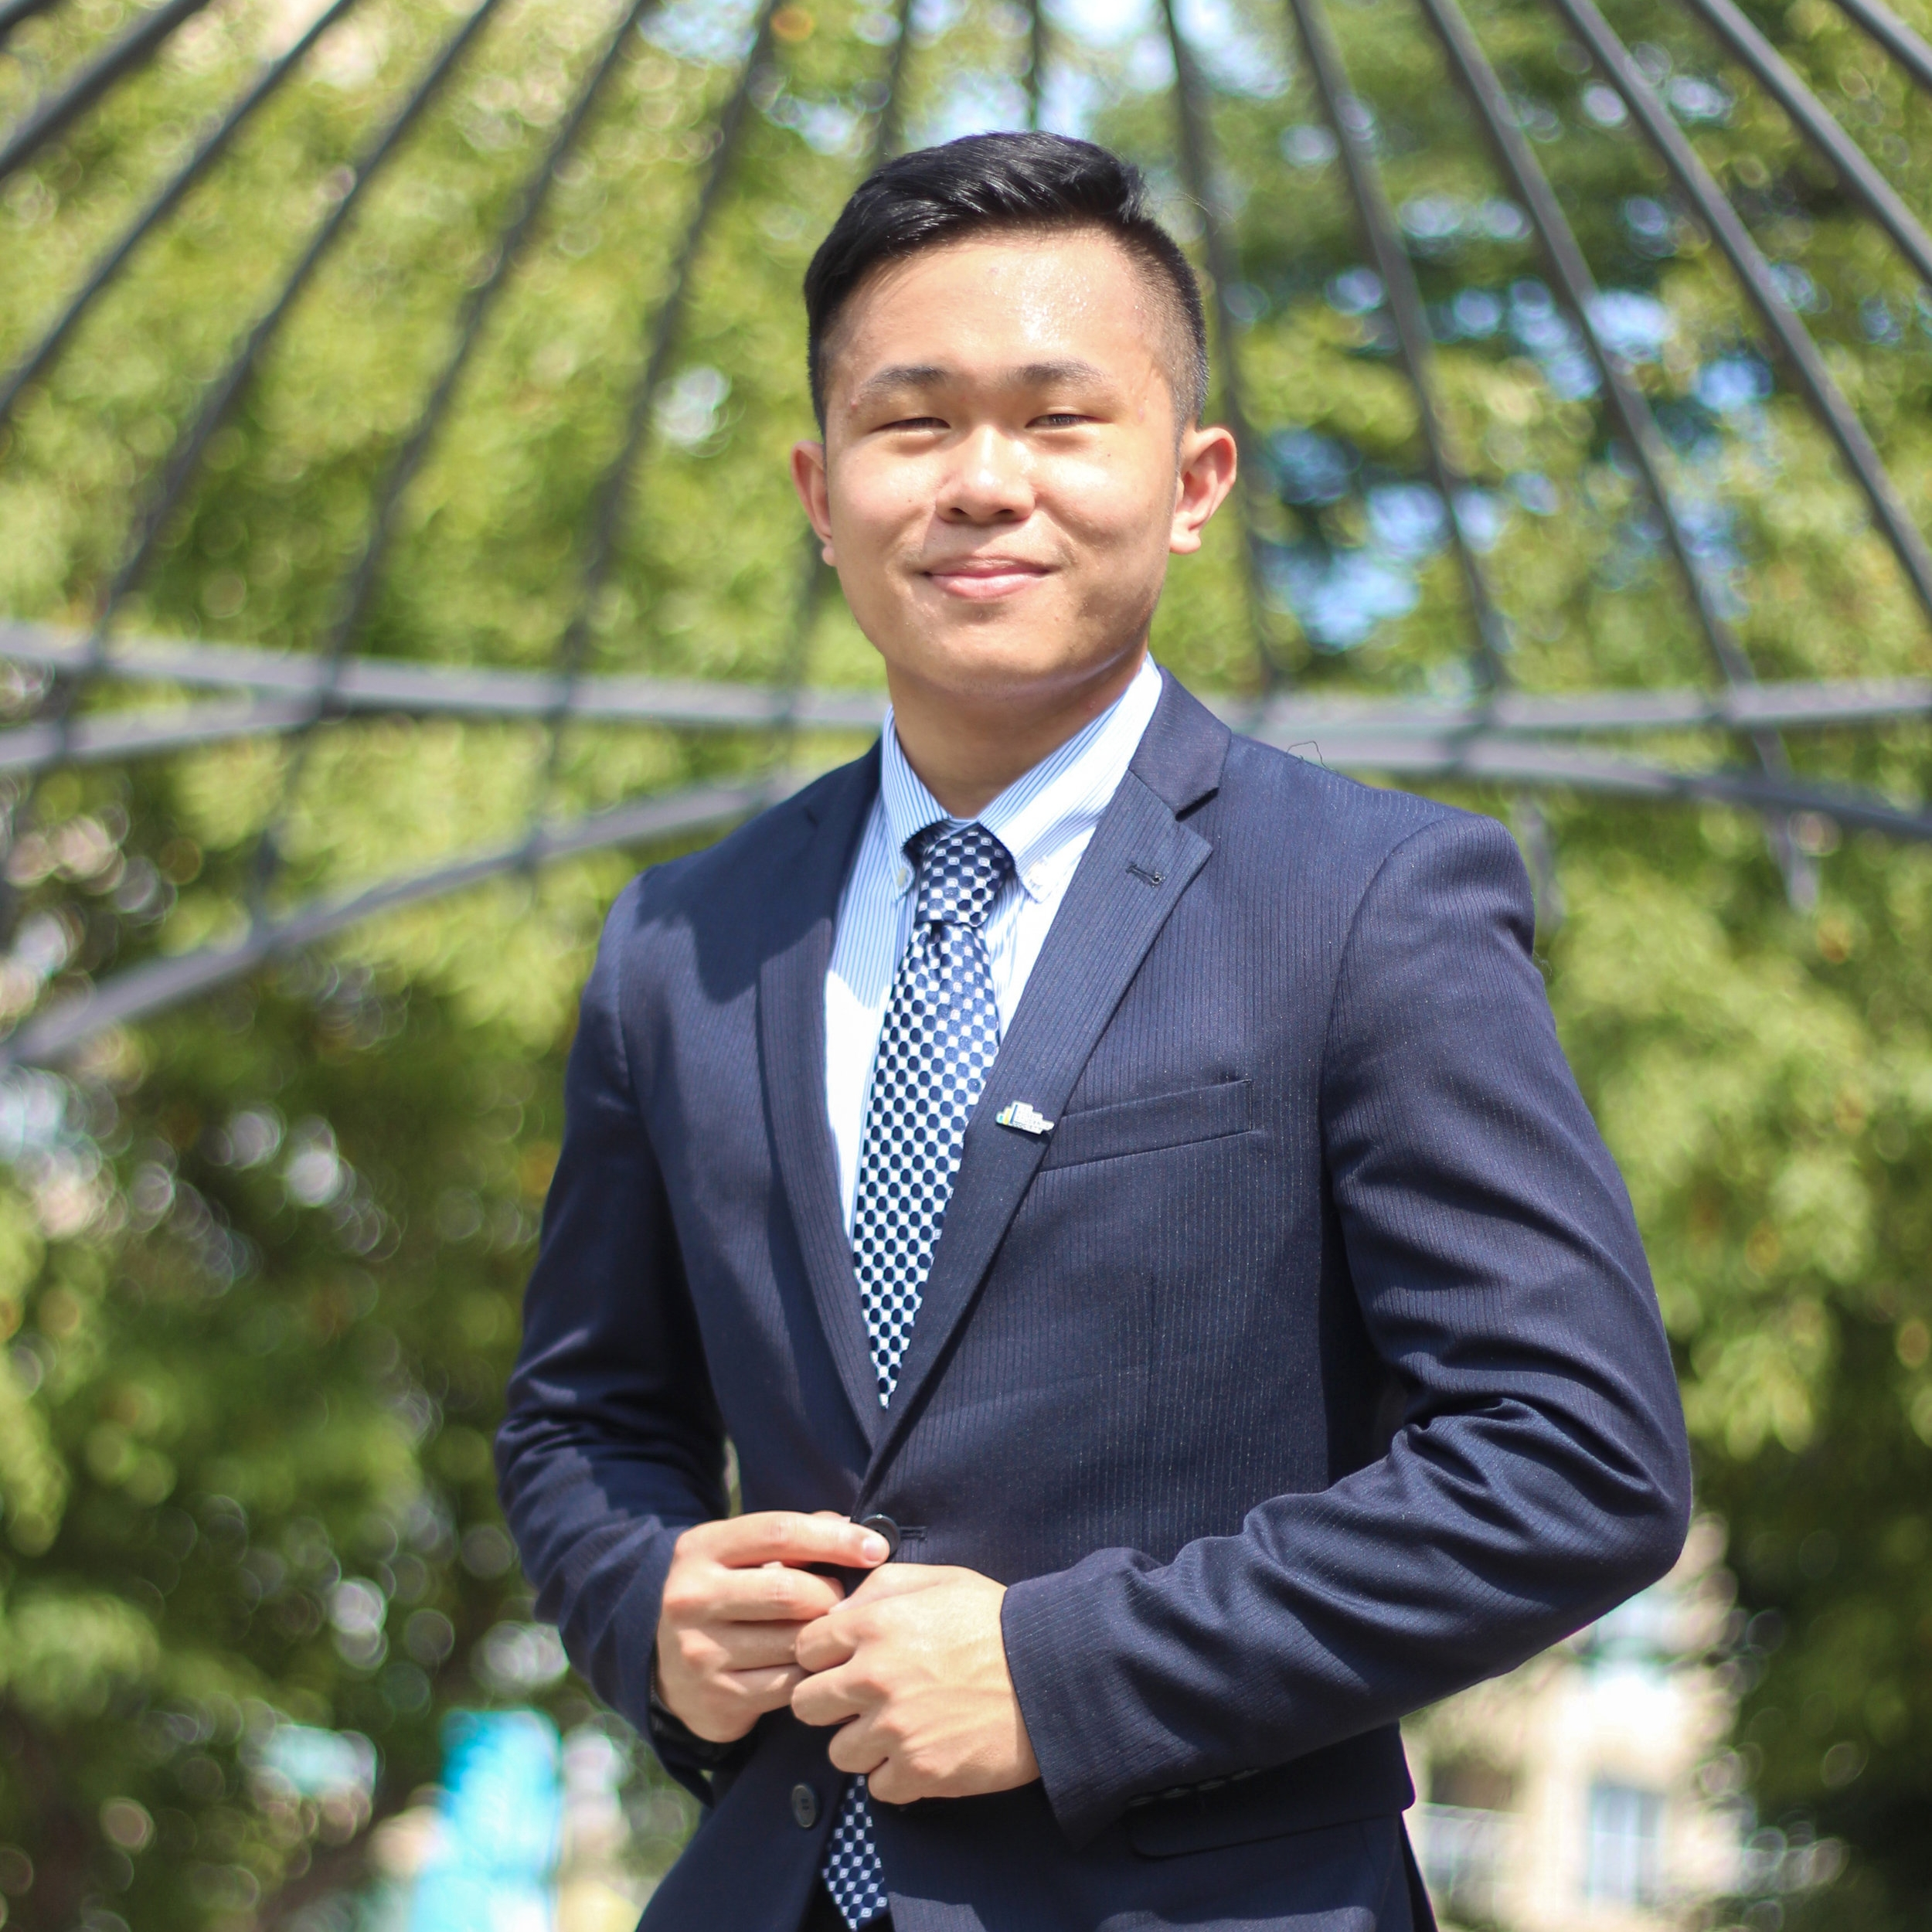 jarod panganiban - general associate  2nd year, majoring in marketing management